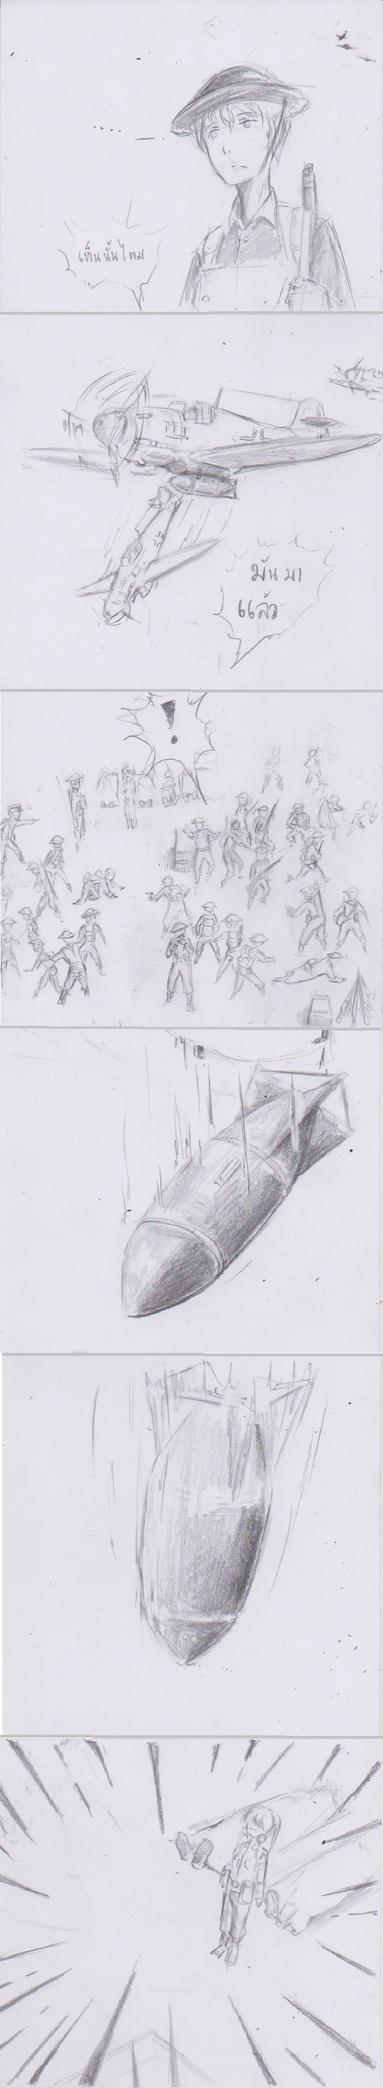 Request 2 by Grafhou